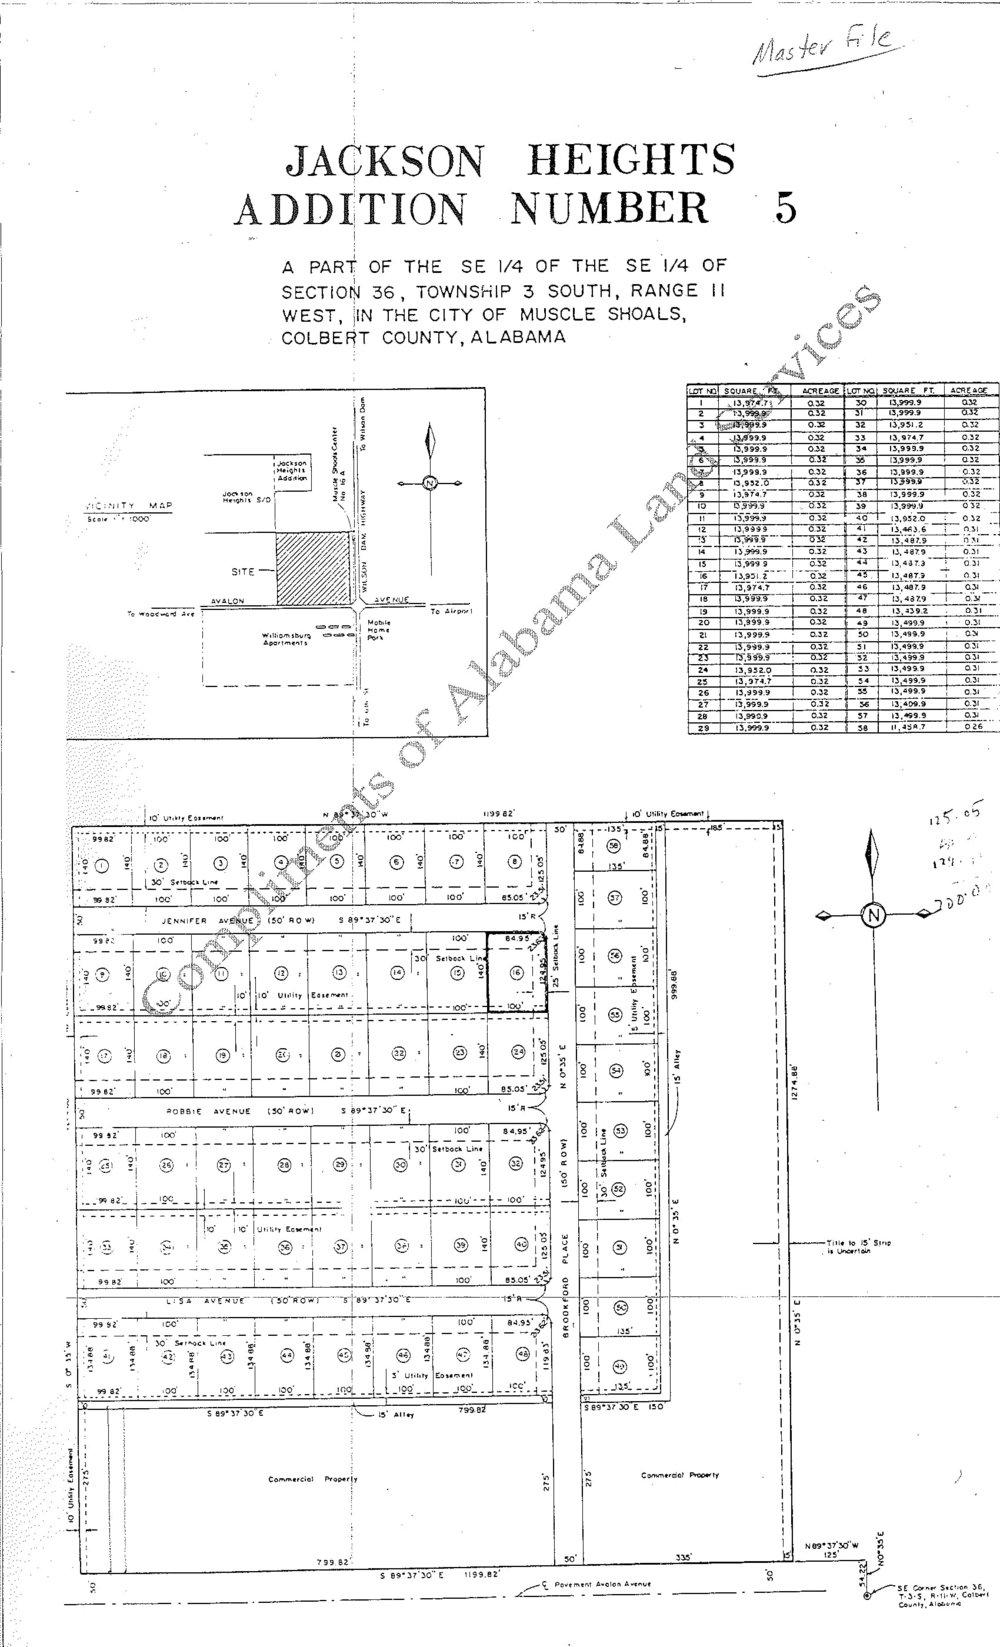 Plat-Jackson-Heights-Addition-No-5-1.jpg